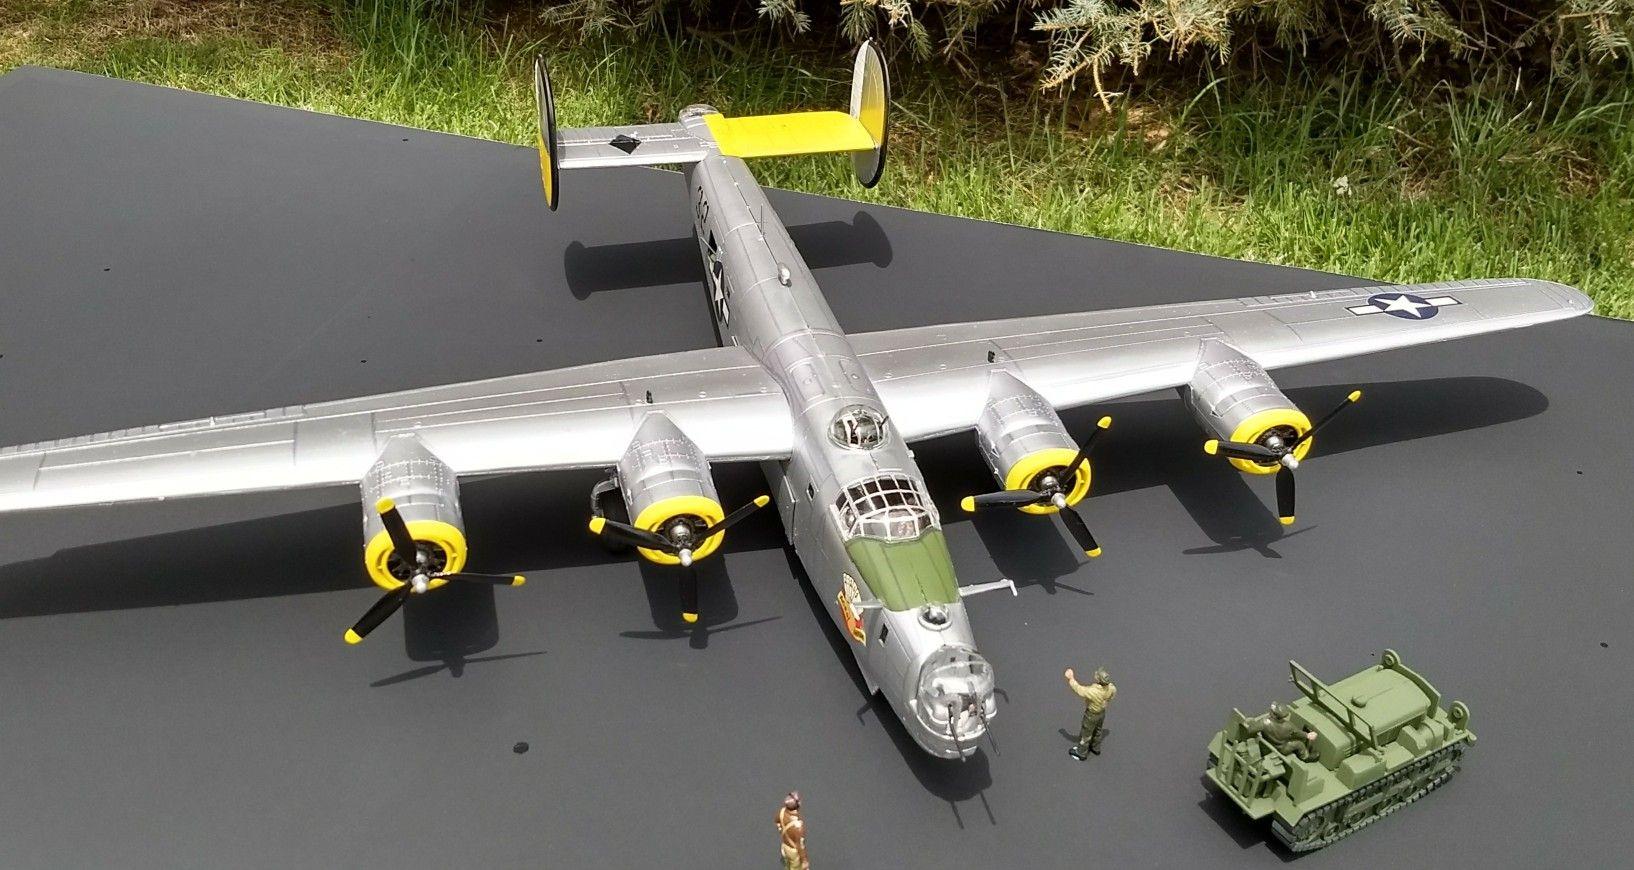 B-24 Liberator American heavy bomber 1:48 Monogram Model